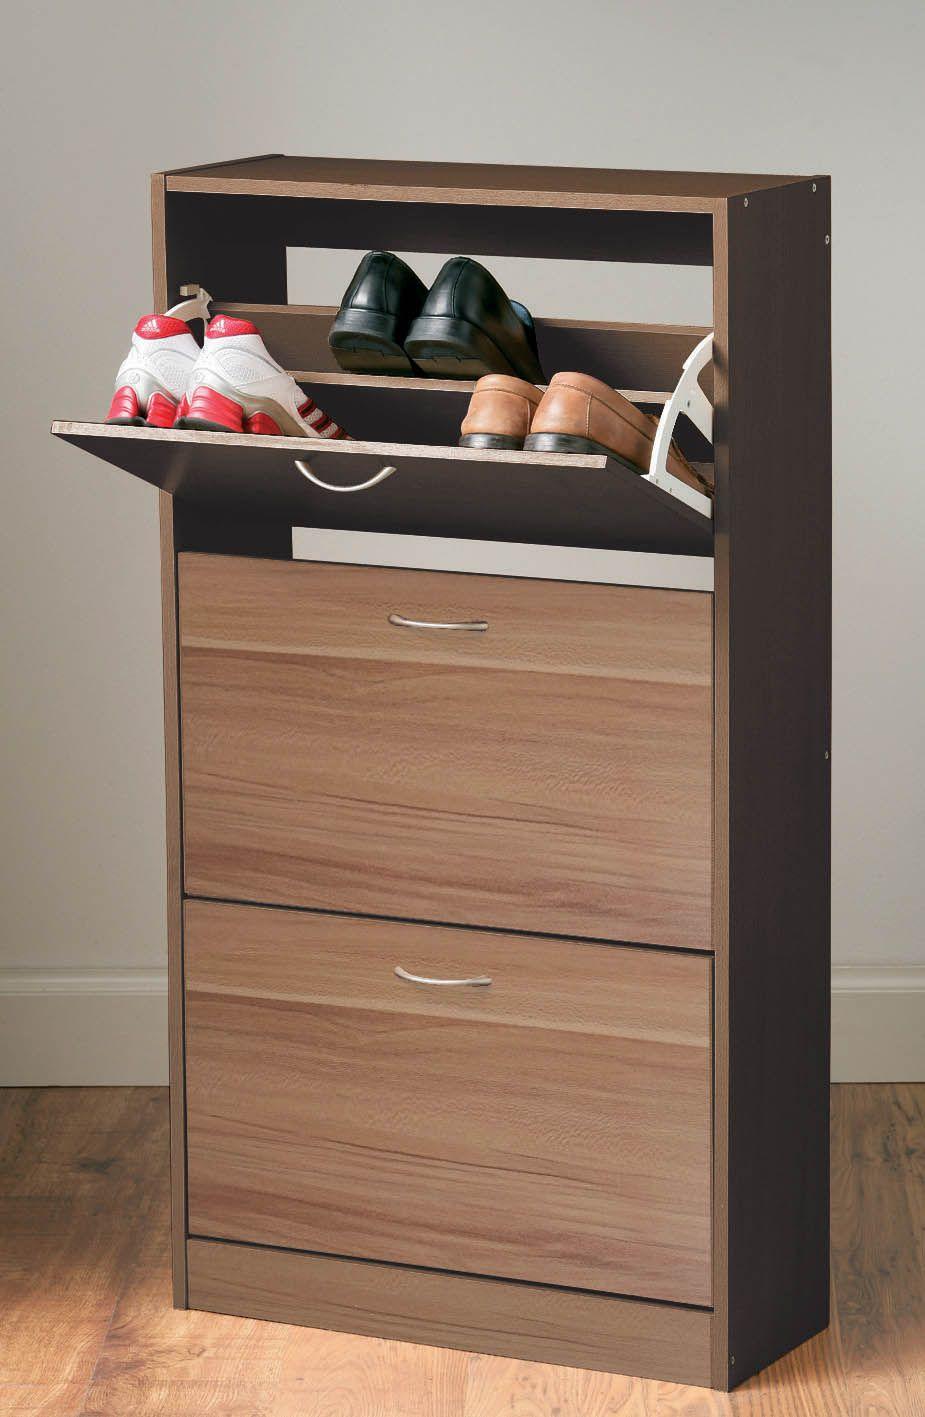 Norsk Shoe Cupboard Shoe Organiser Storage Rack Unit 3 Drawer